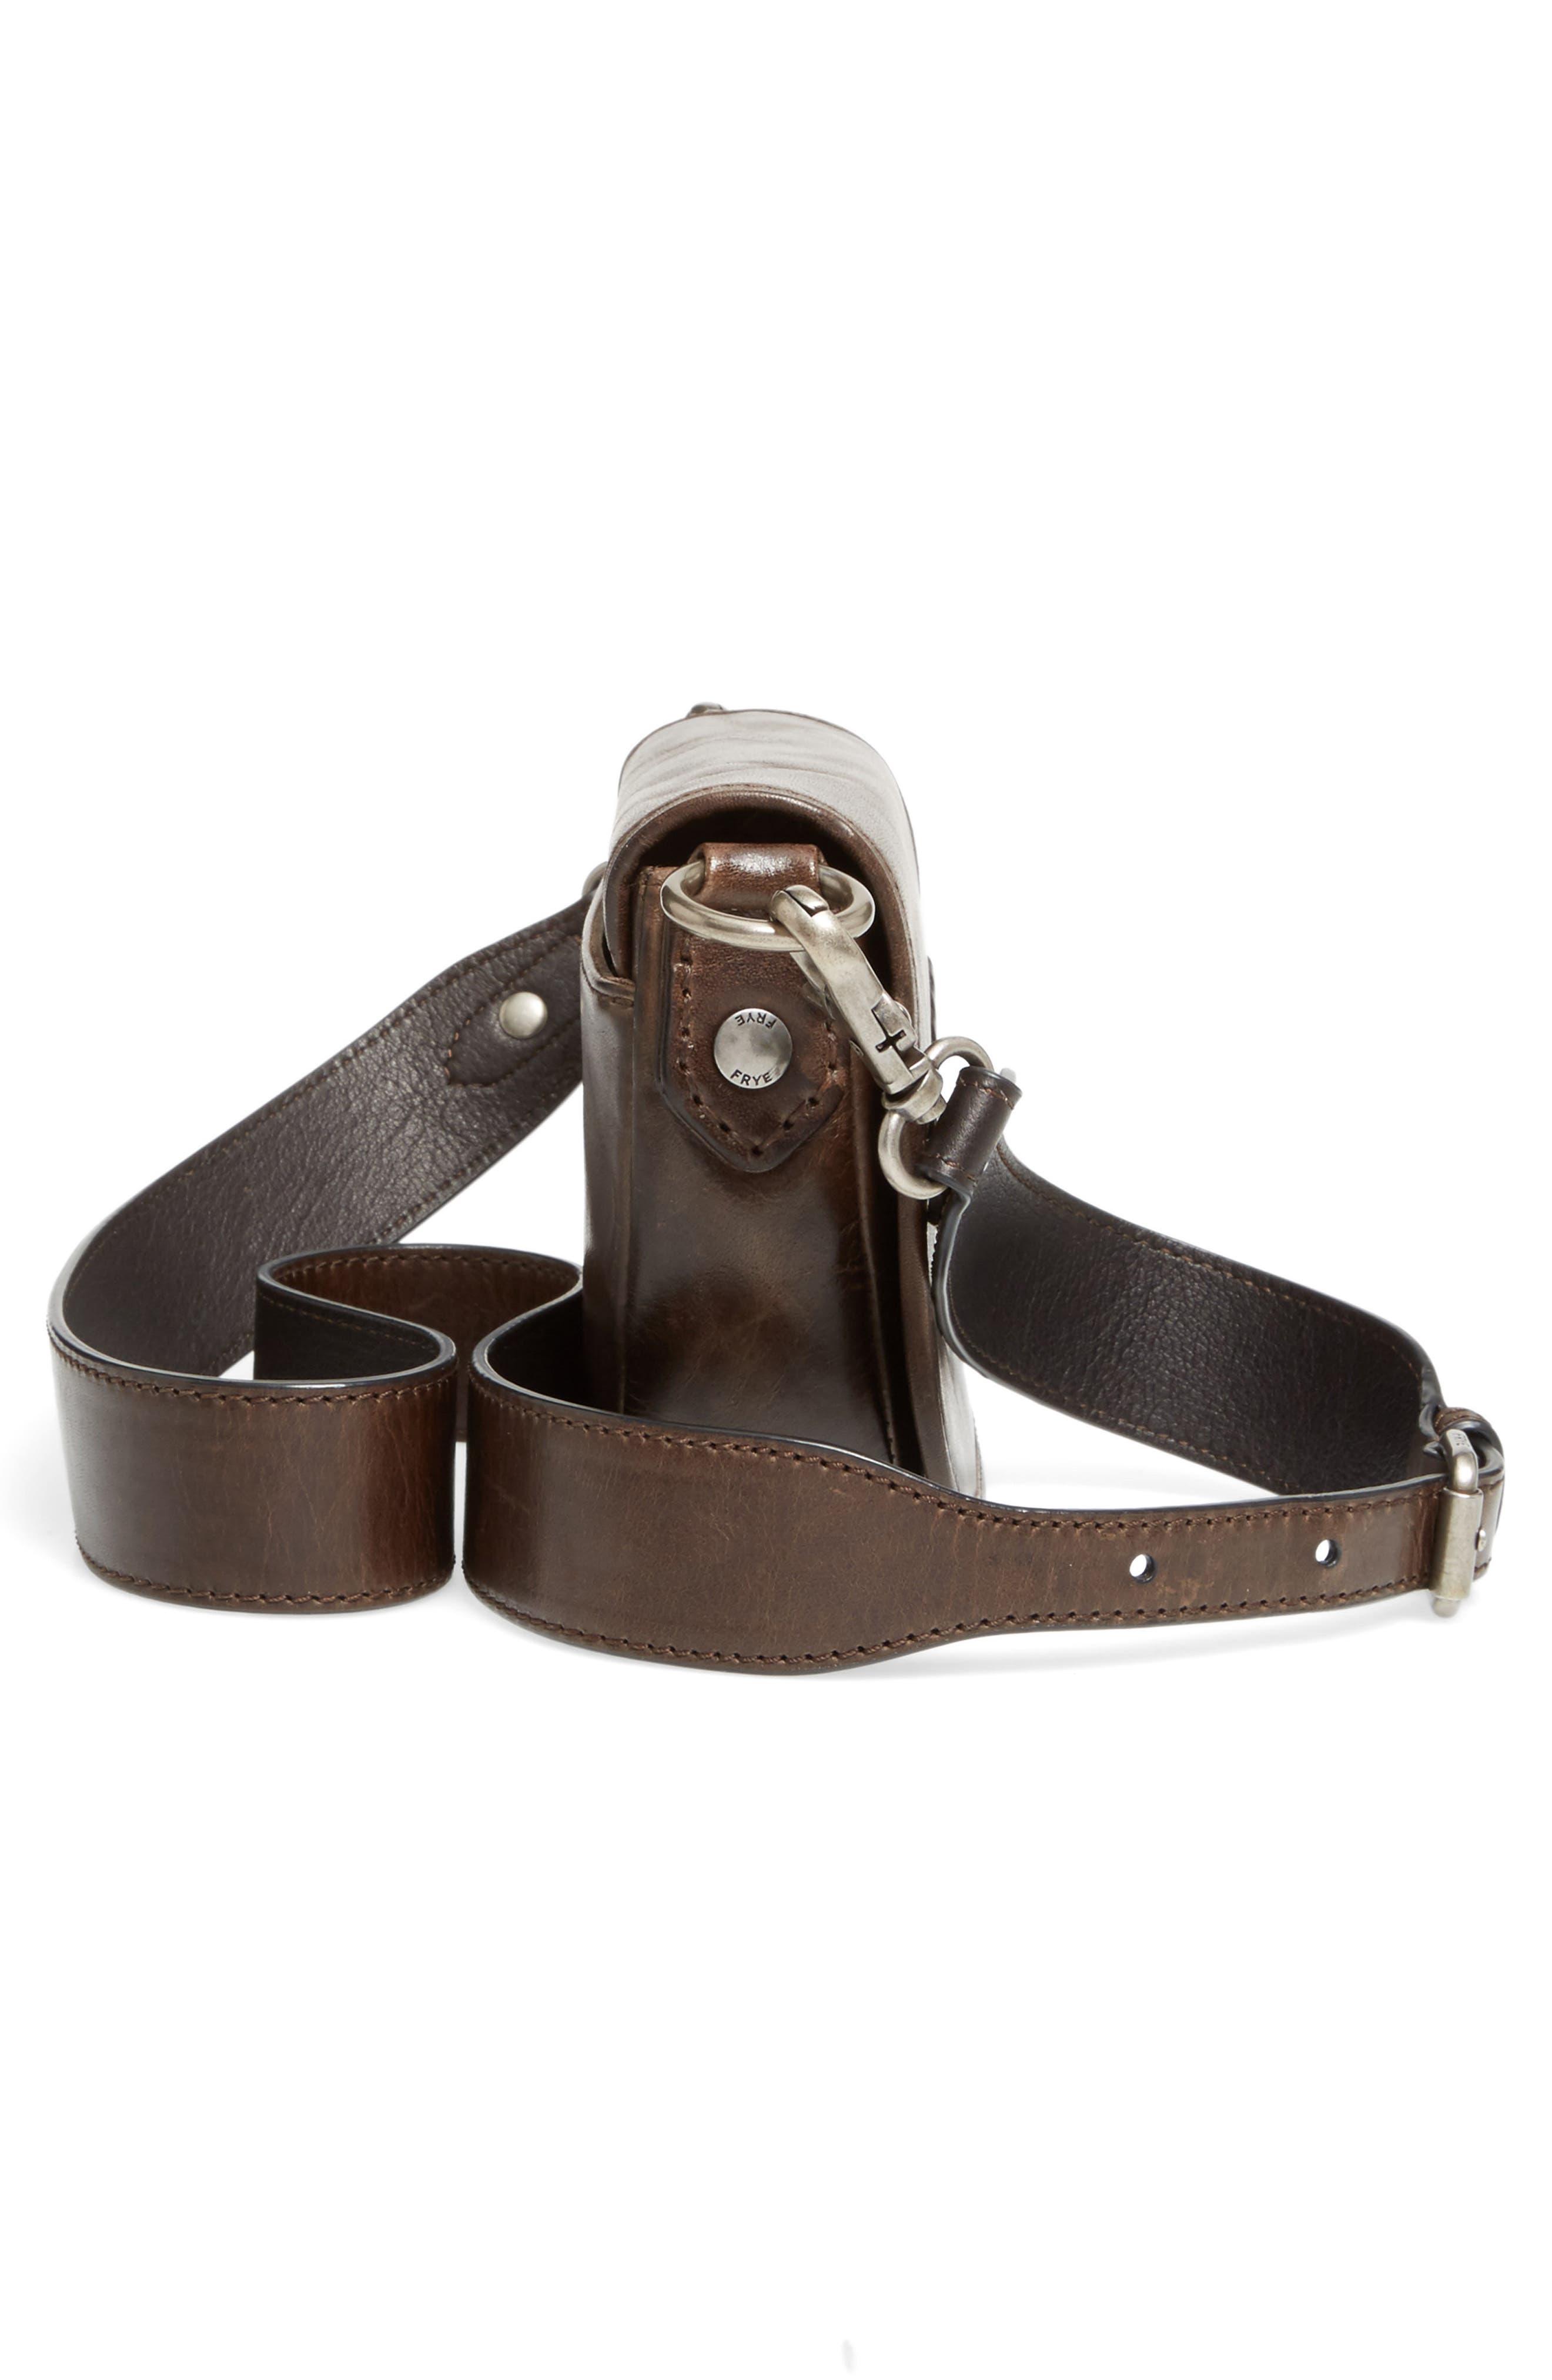 Mini Melissa Whipstitch Leather Saddle Bag,                             Alternate thumbnail 5, color,                             203